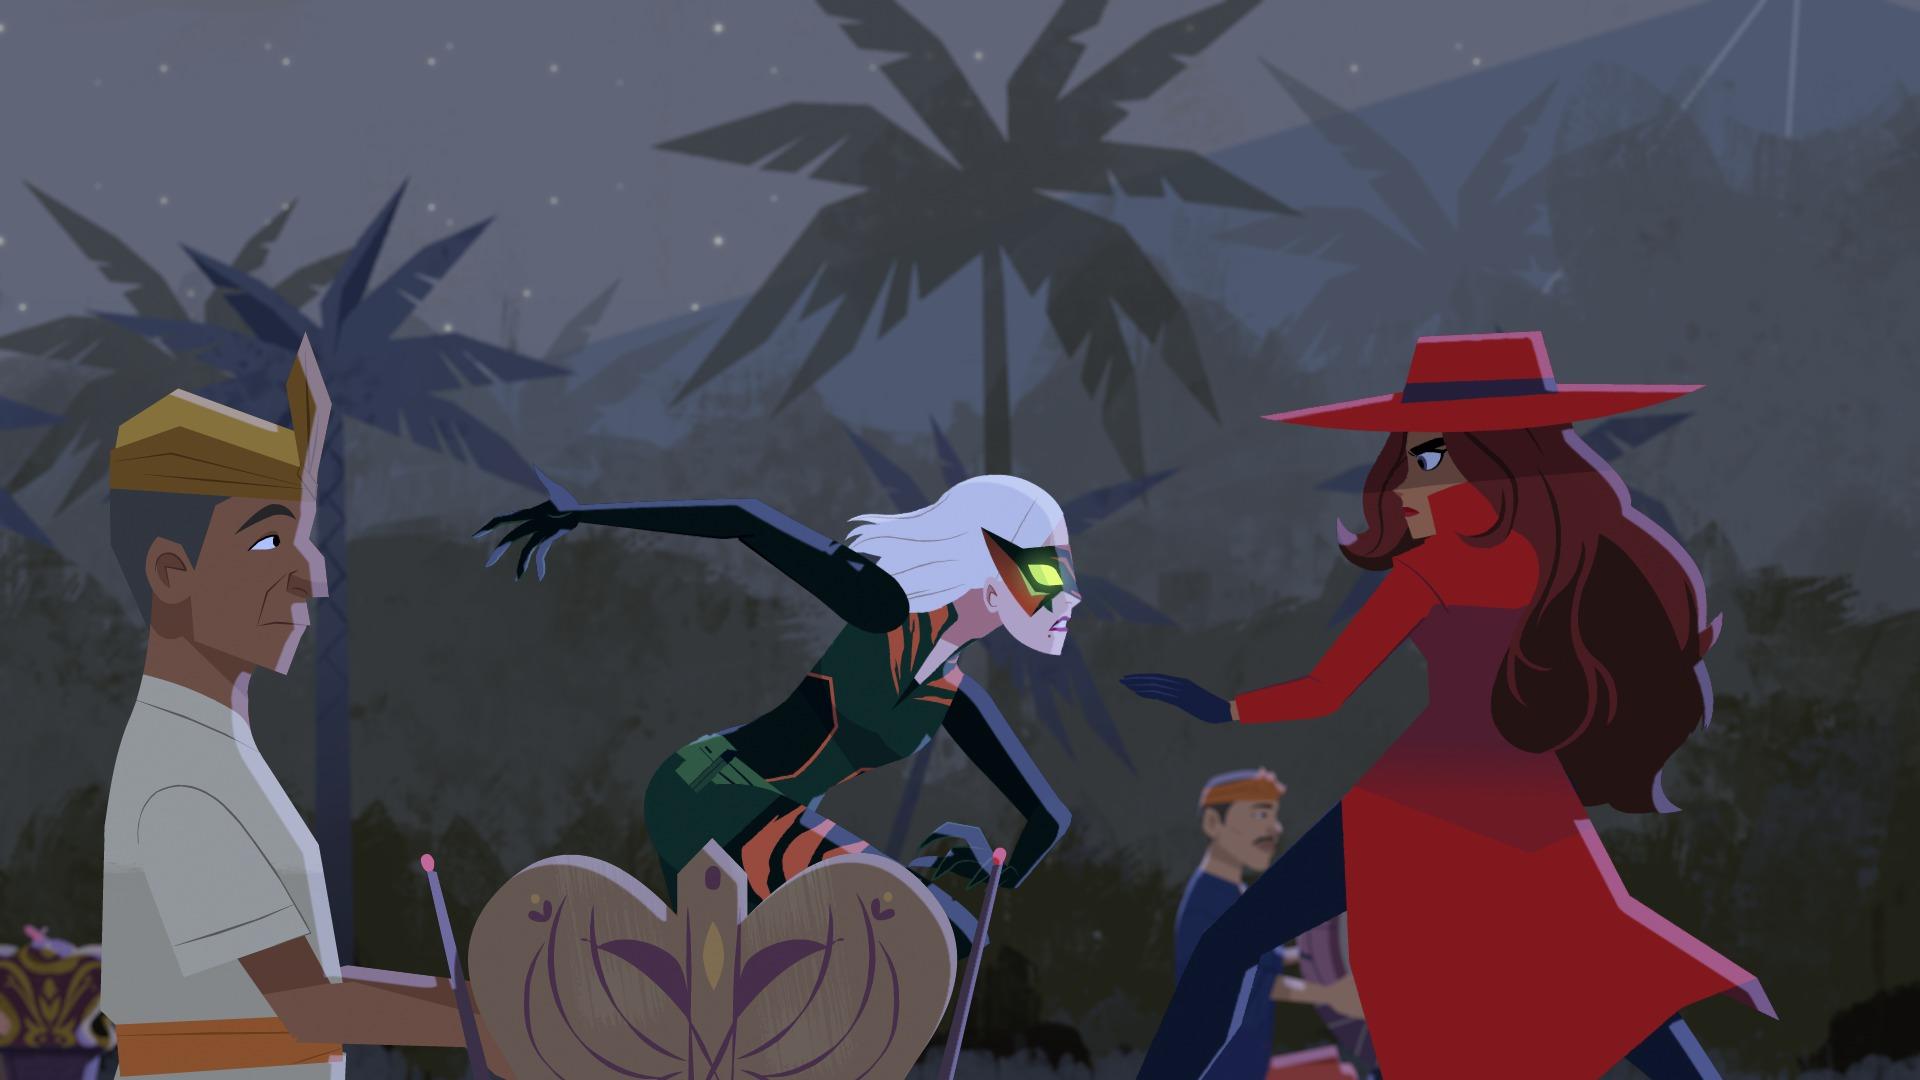 Carmen Sandiego: una scena della serie targata Netflix